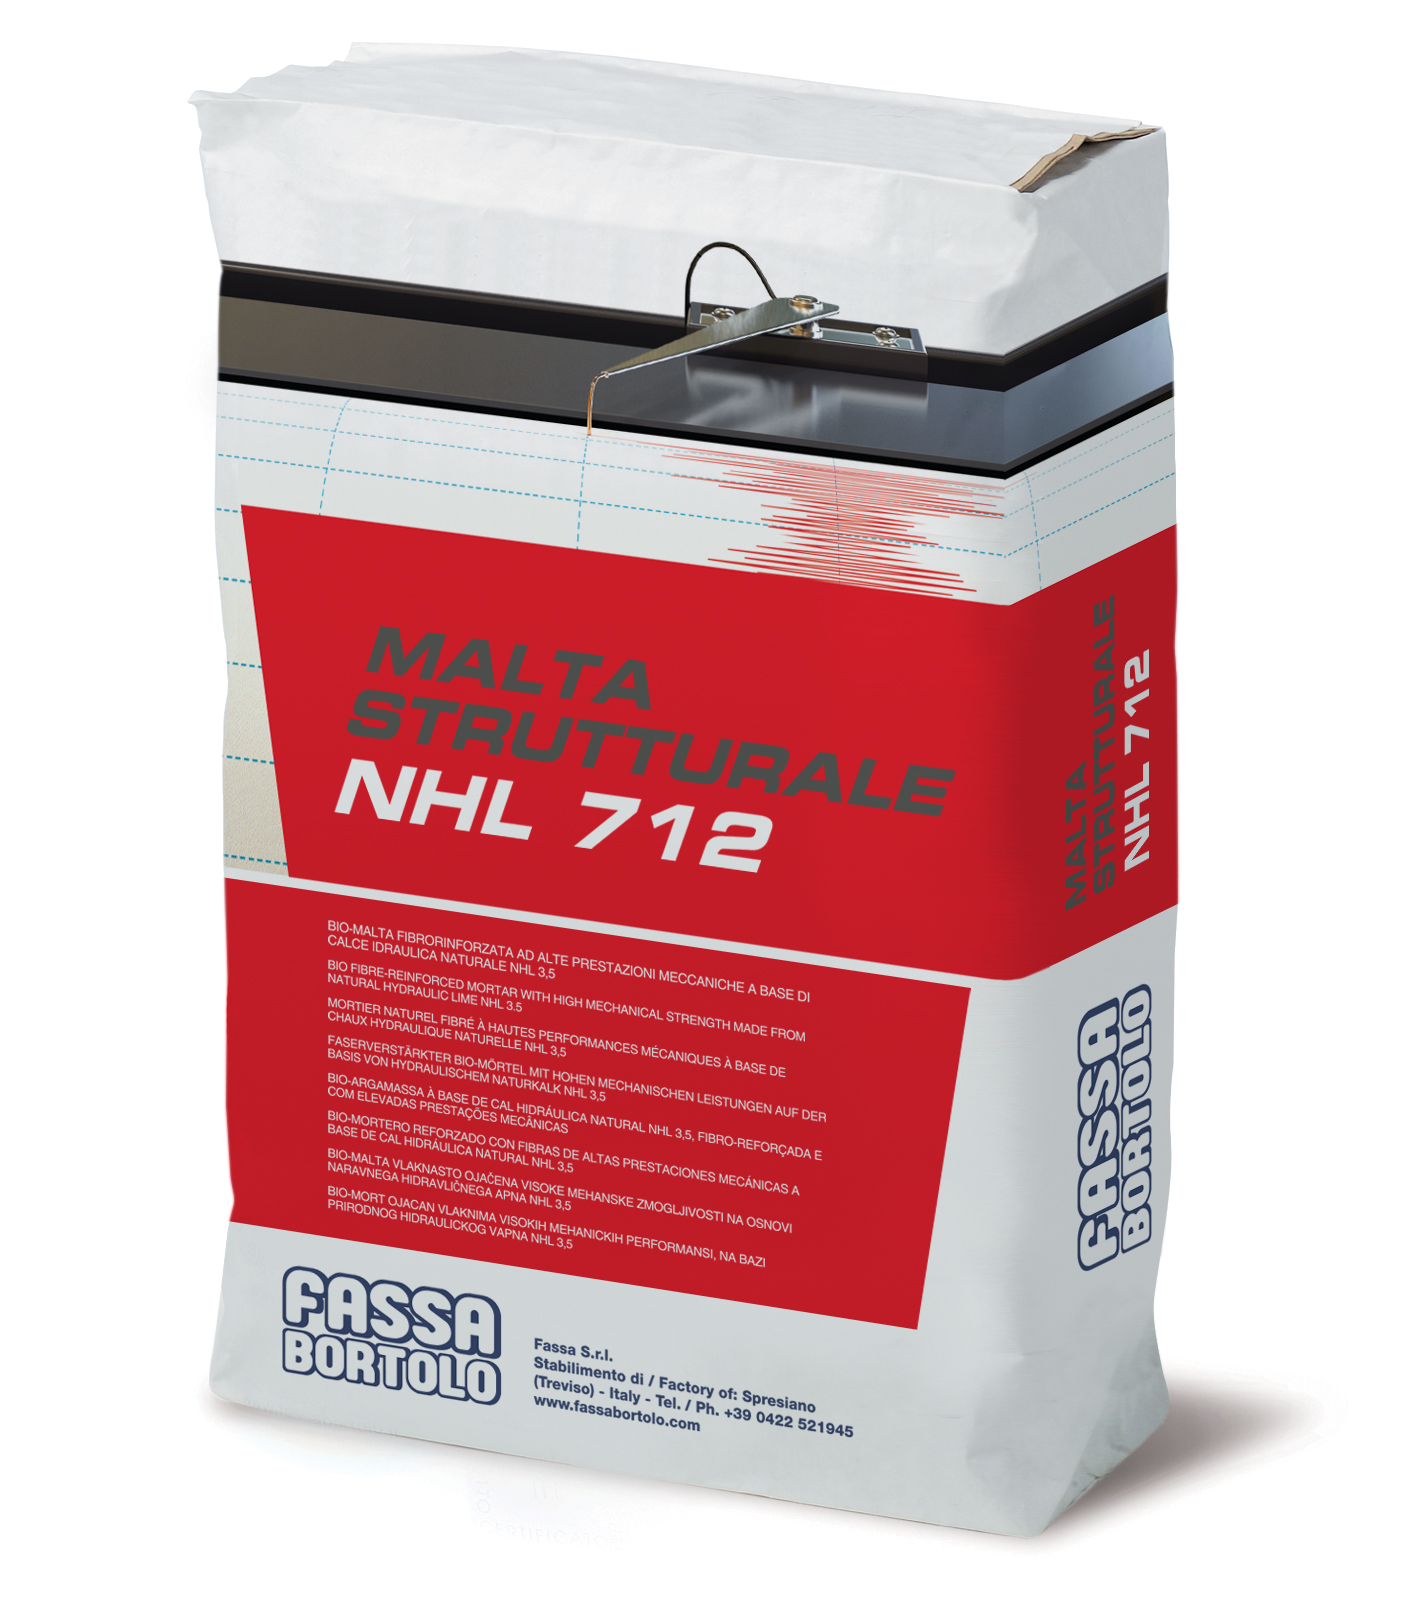 MALTA STRUTTURALE NHL 712: Bio-malta fibrorinforzata strutturale a base di calce idraulica naturale NHL 3,5 per interni ed esterni